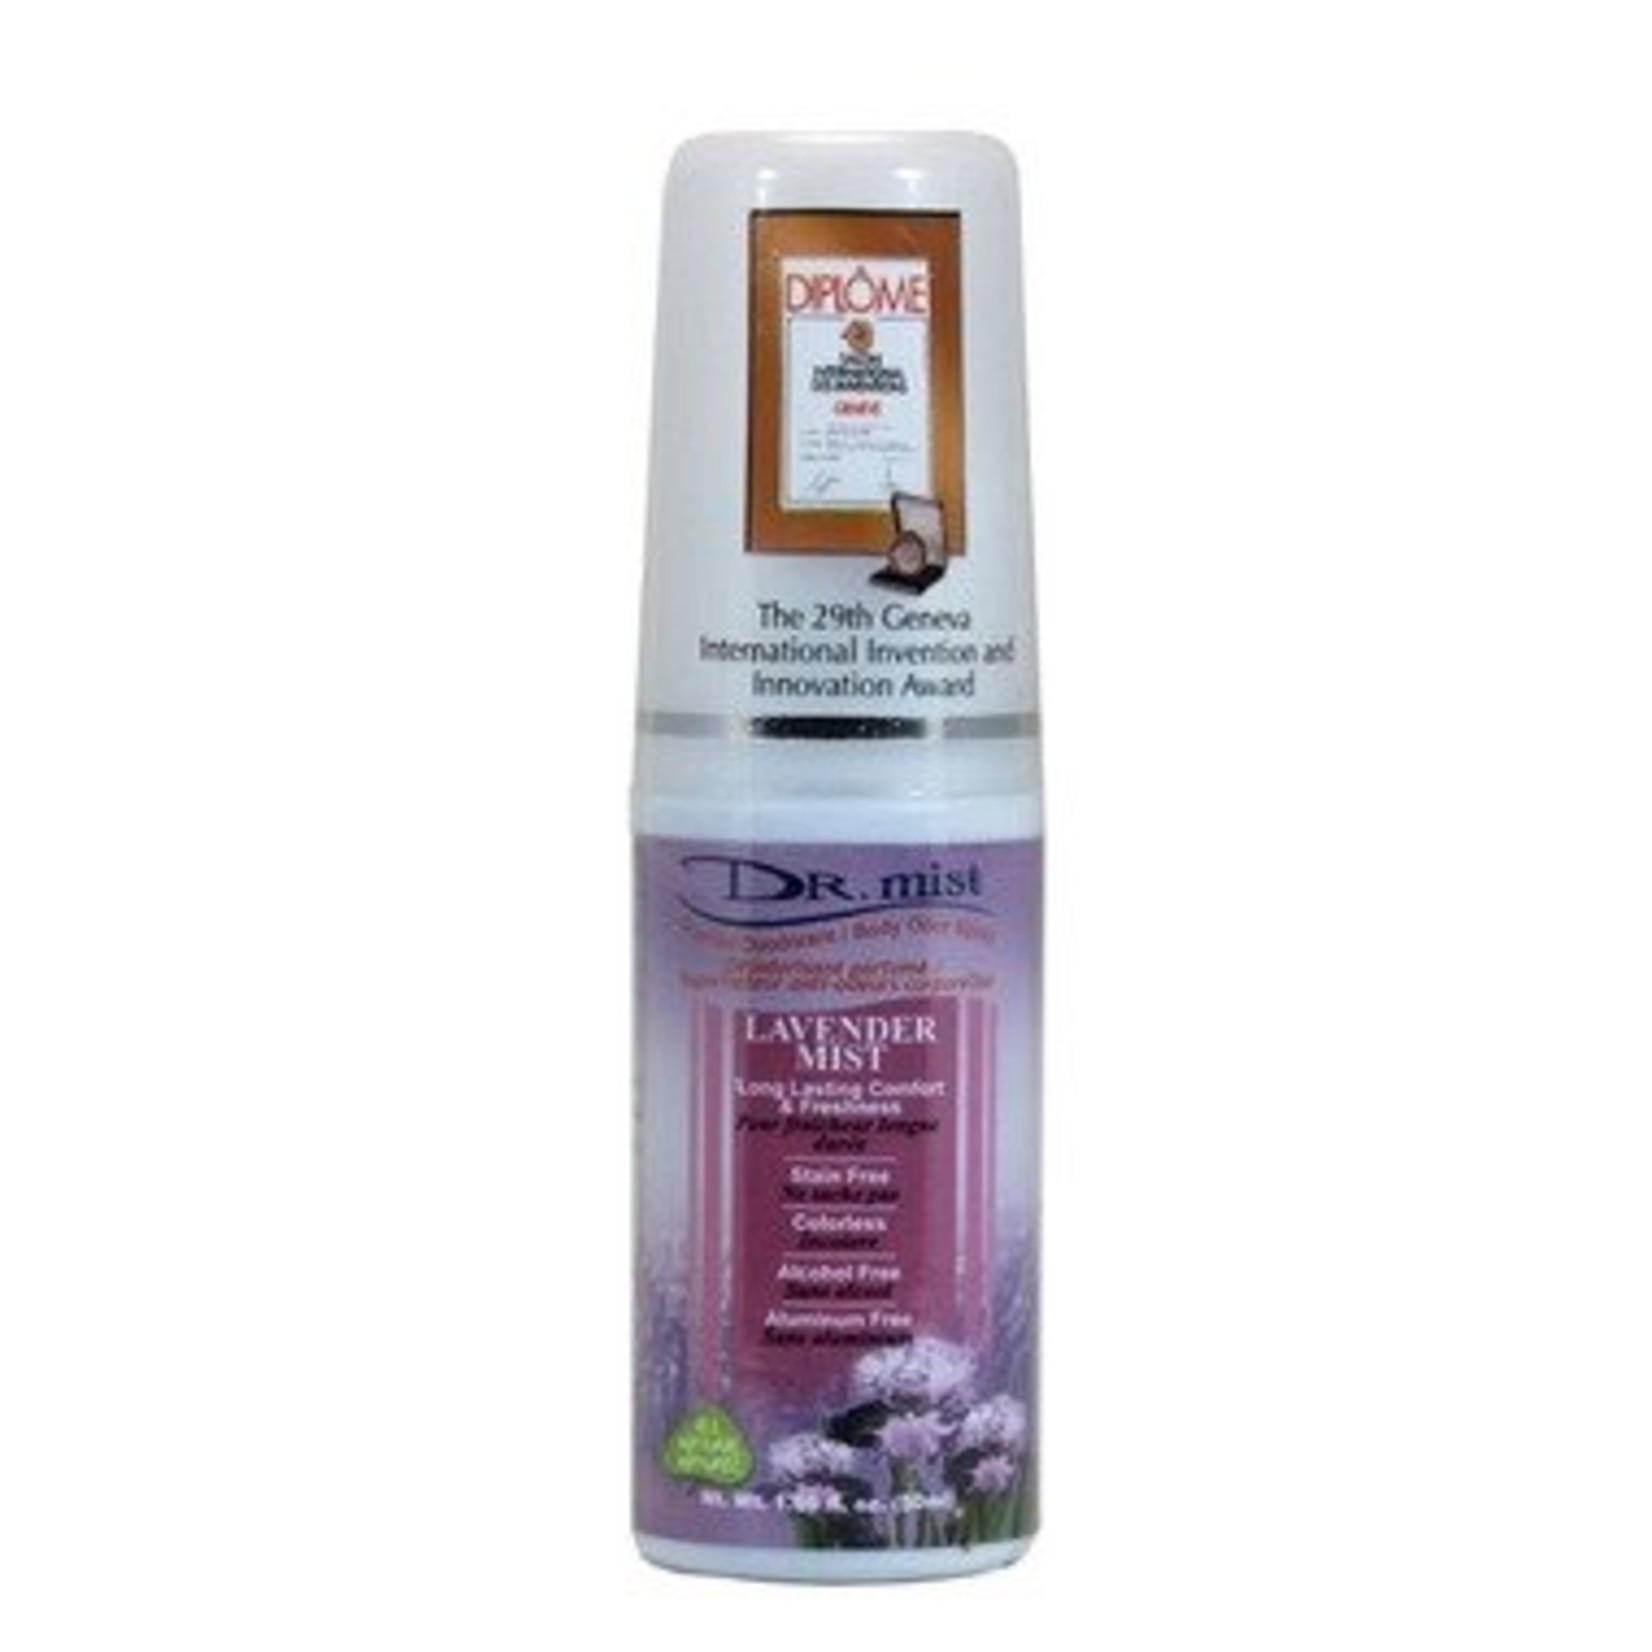 Dr. Mist Dr Mist Deodorant Spray Lavender 50ml